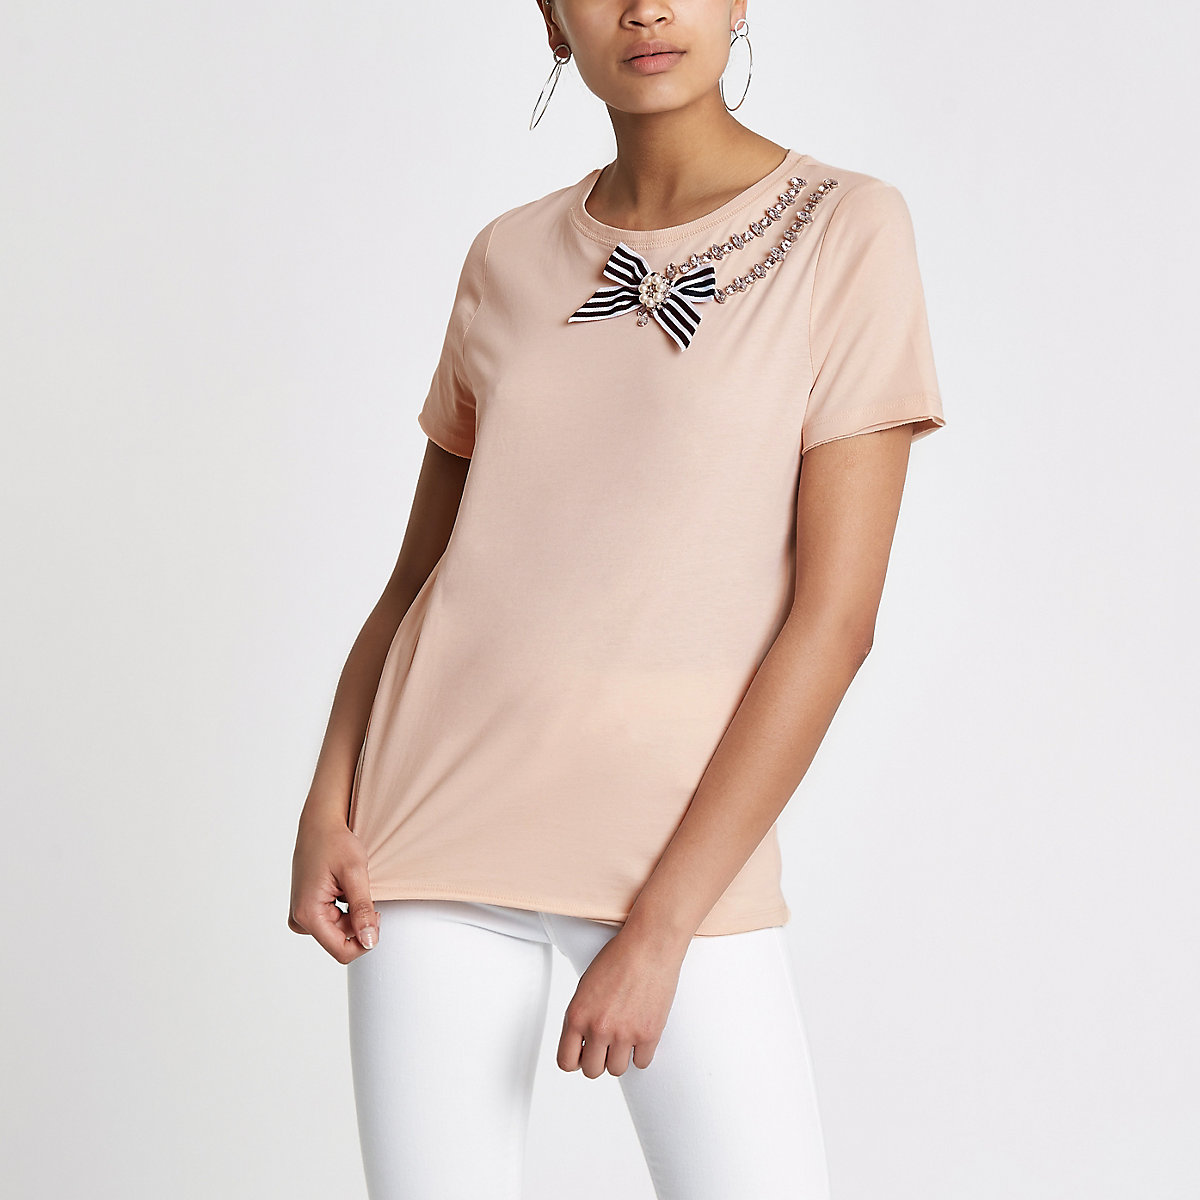 Light pink rhinestone bow trim T-shirt